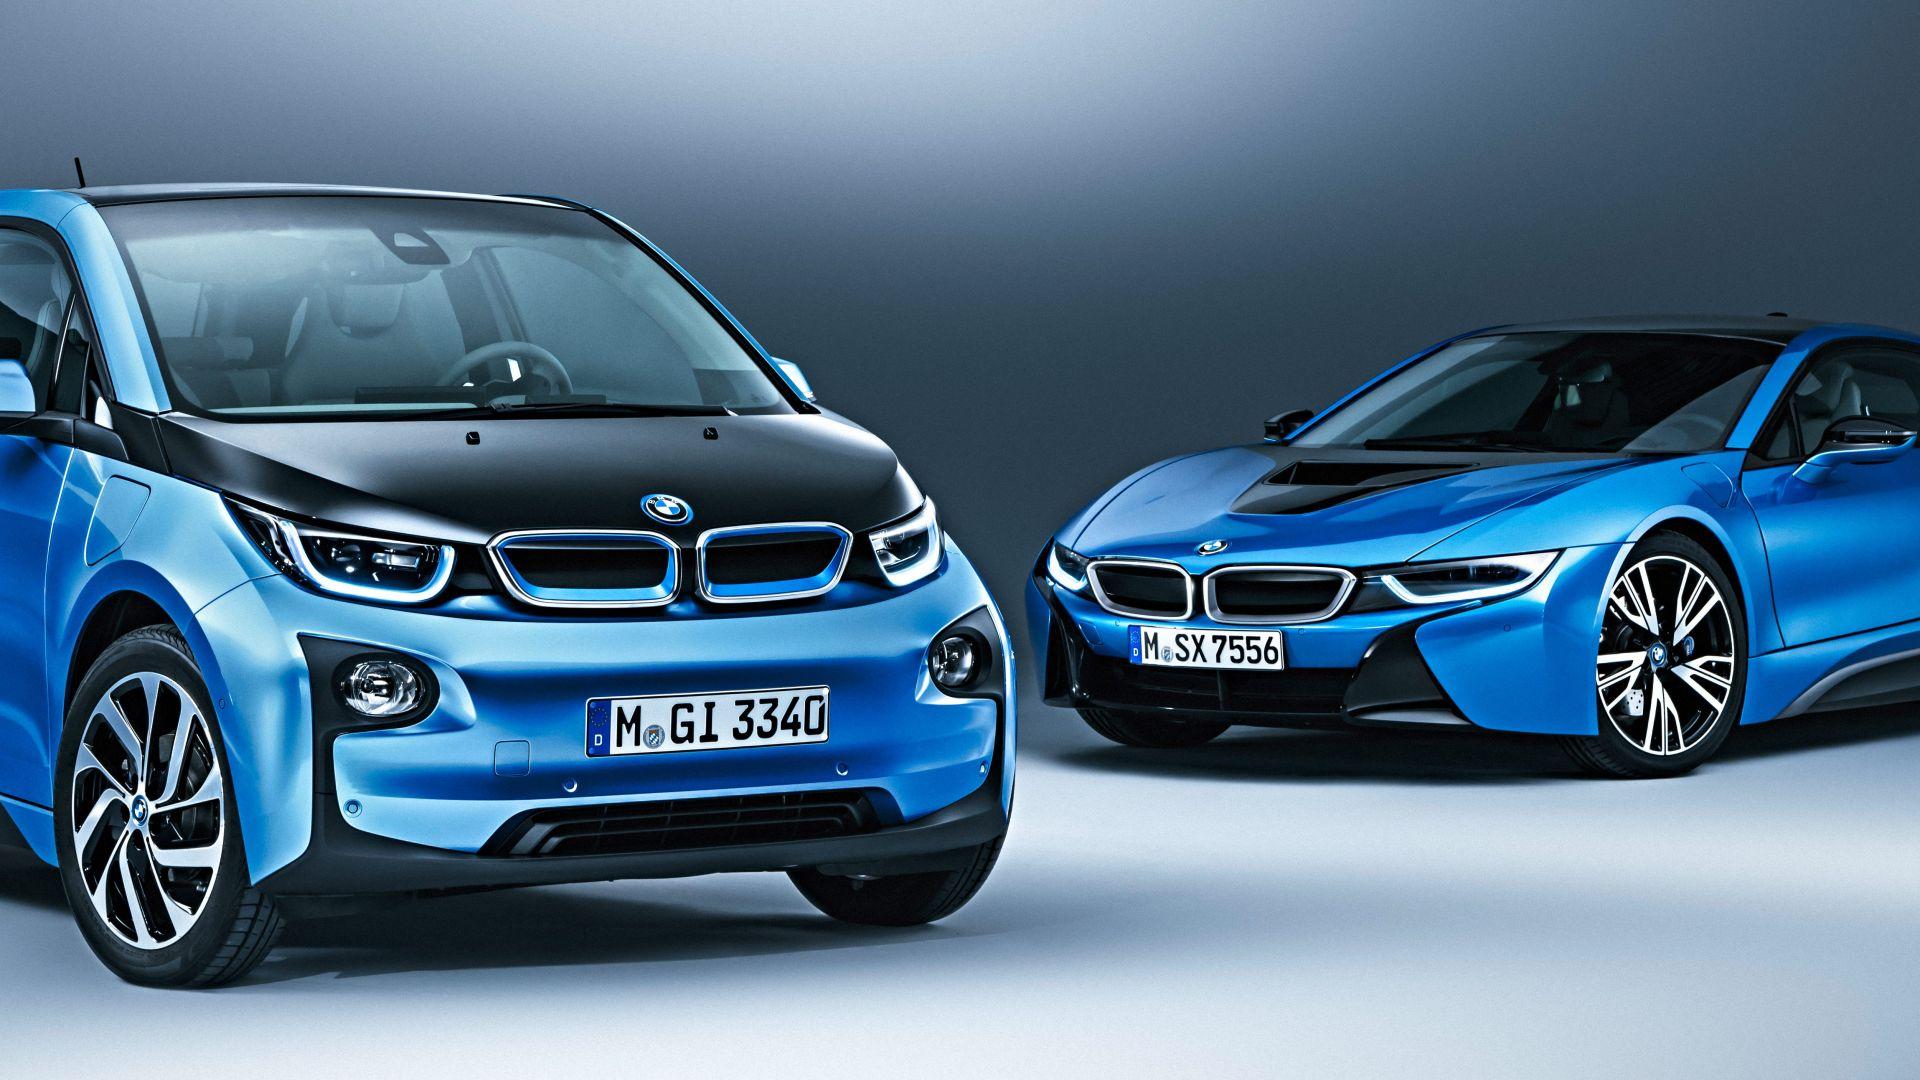 wallpaper bmw i3 protonic blue  electric cars  electric  blue  cars  u0026 bikes  10613